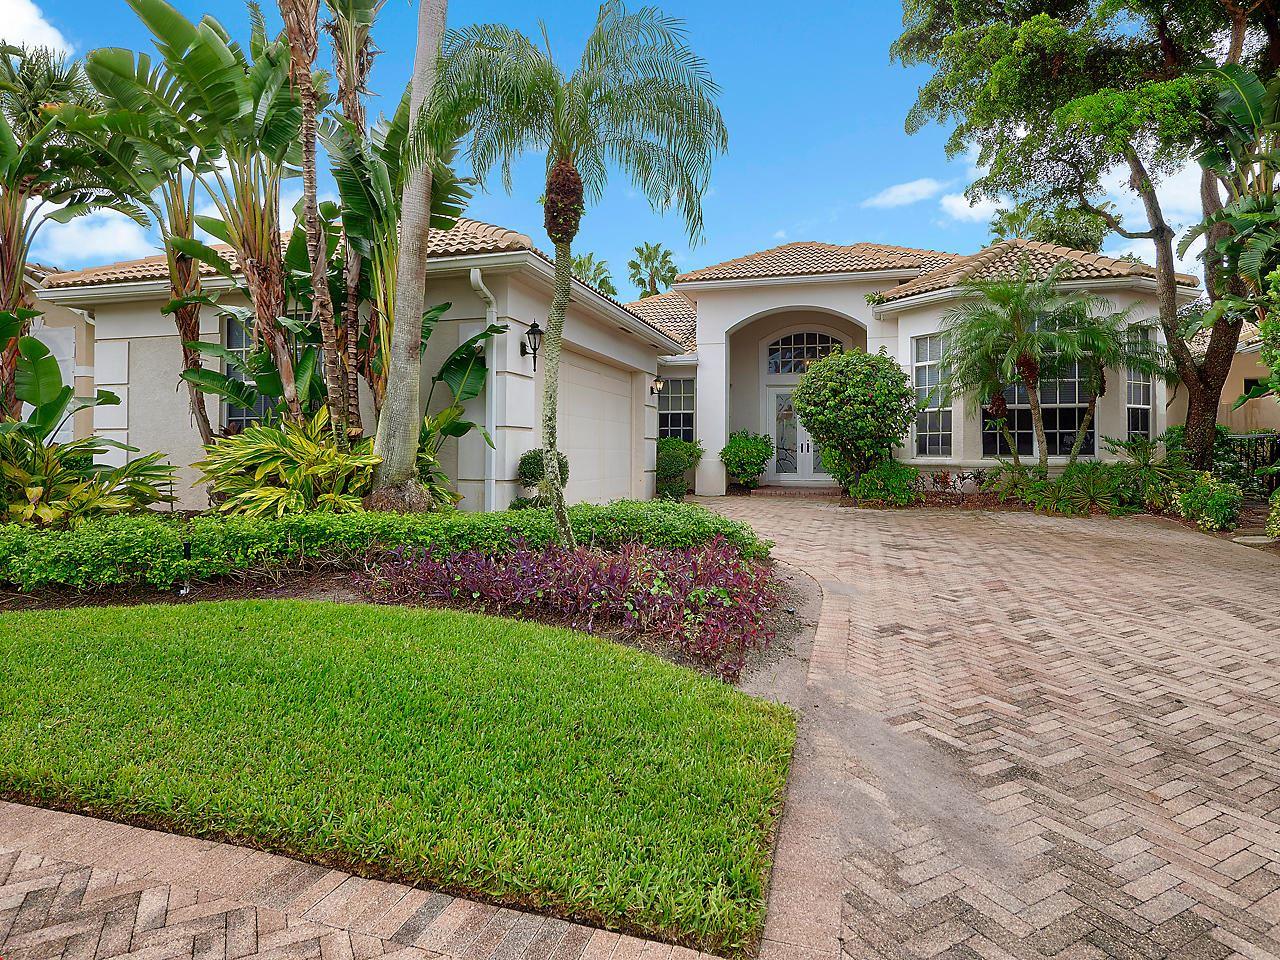 Photo of 133 Banyan Isle Drive, Palm Beach Gardens, FL 33418 (MLS # RX-10663058)